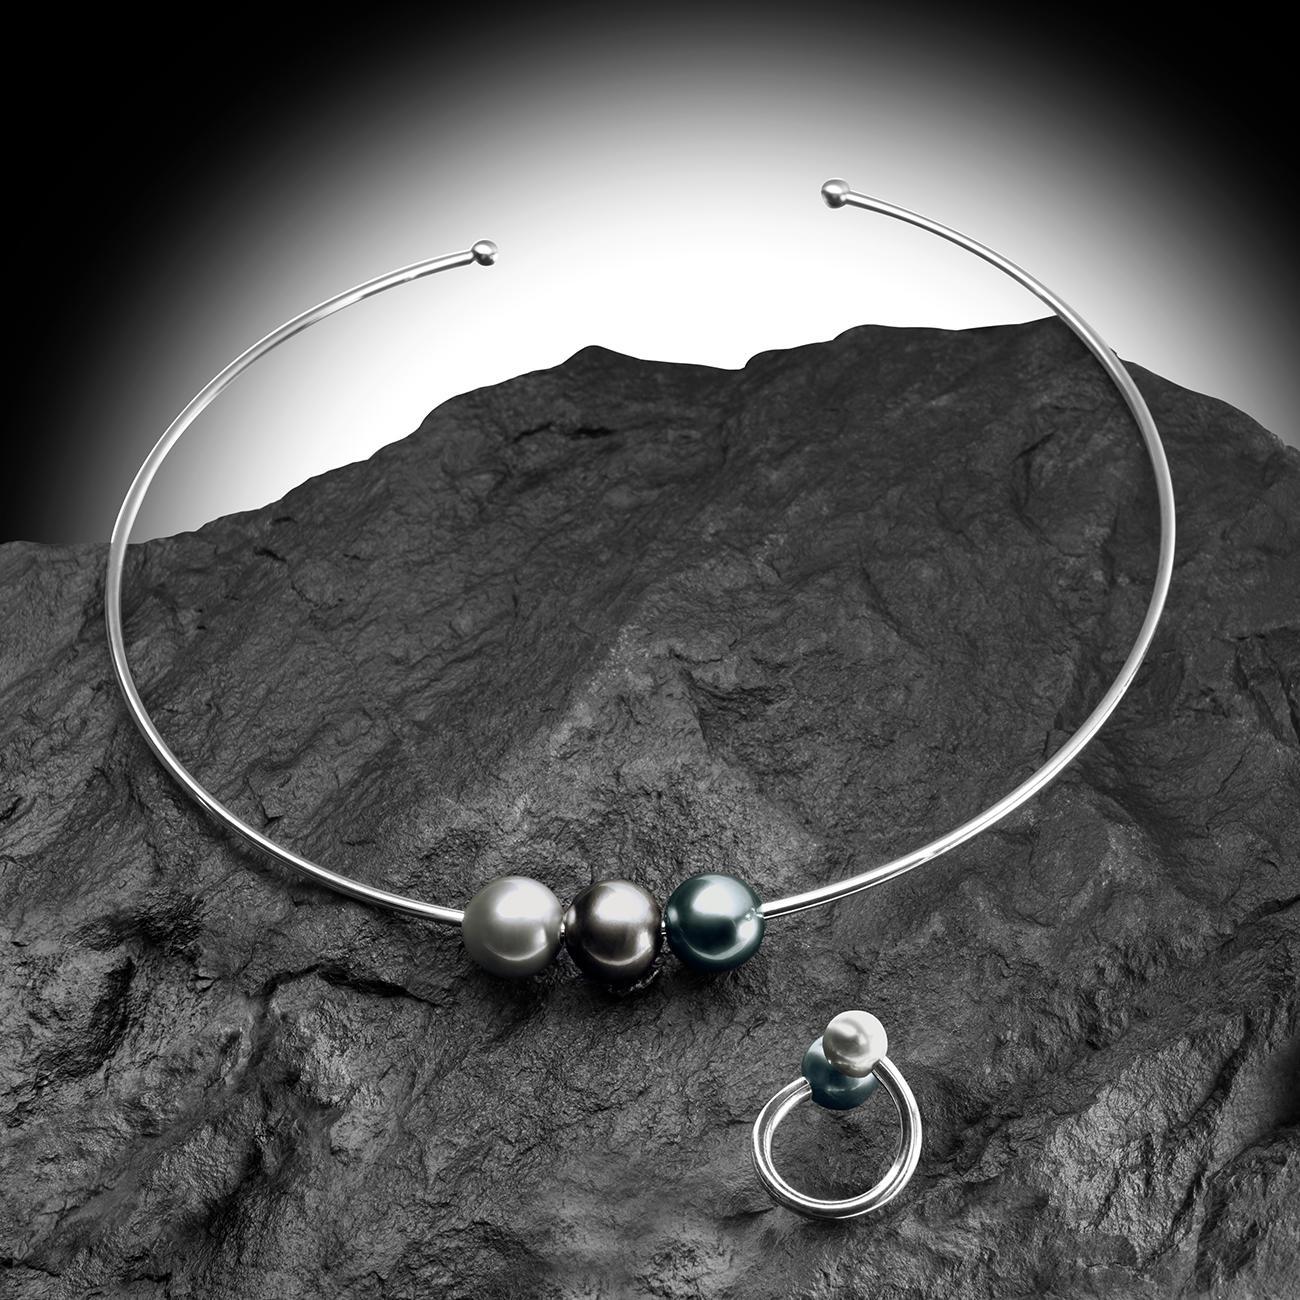 Tahitiperlen-Halsreif, 925er-Sterling-Silber, 3 Tahiti-Perlen